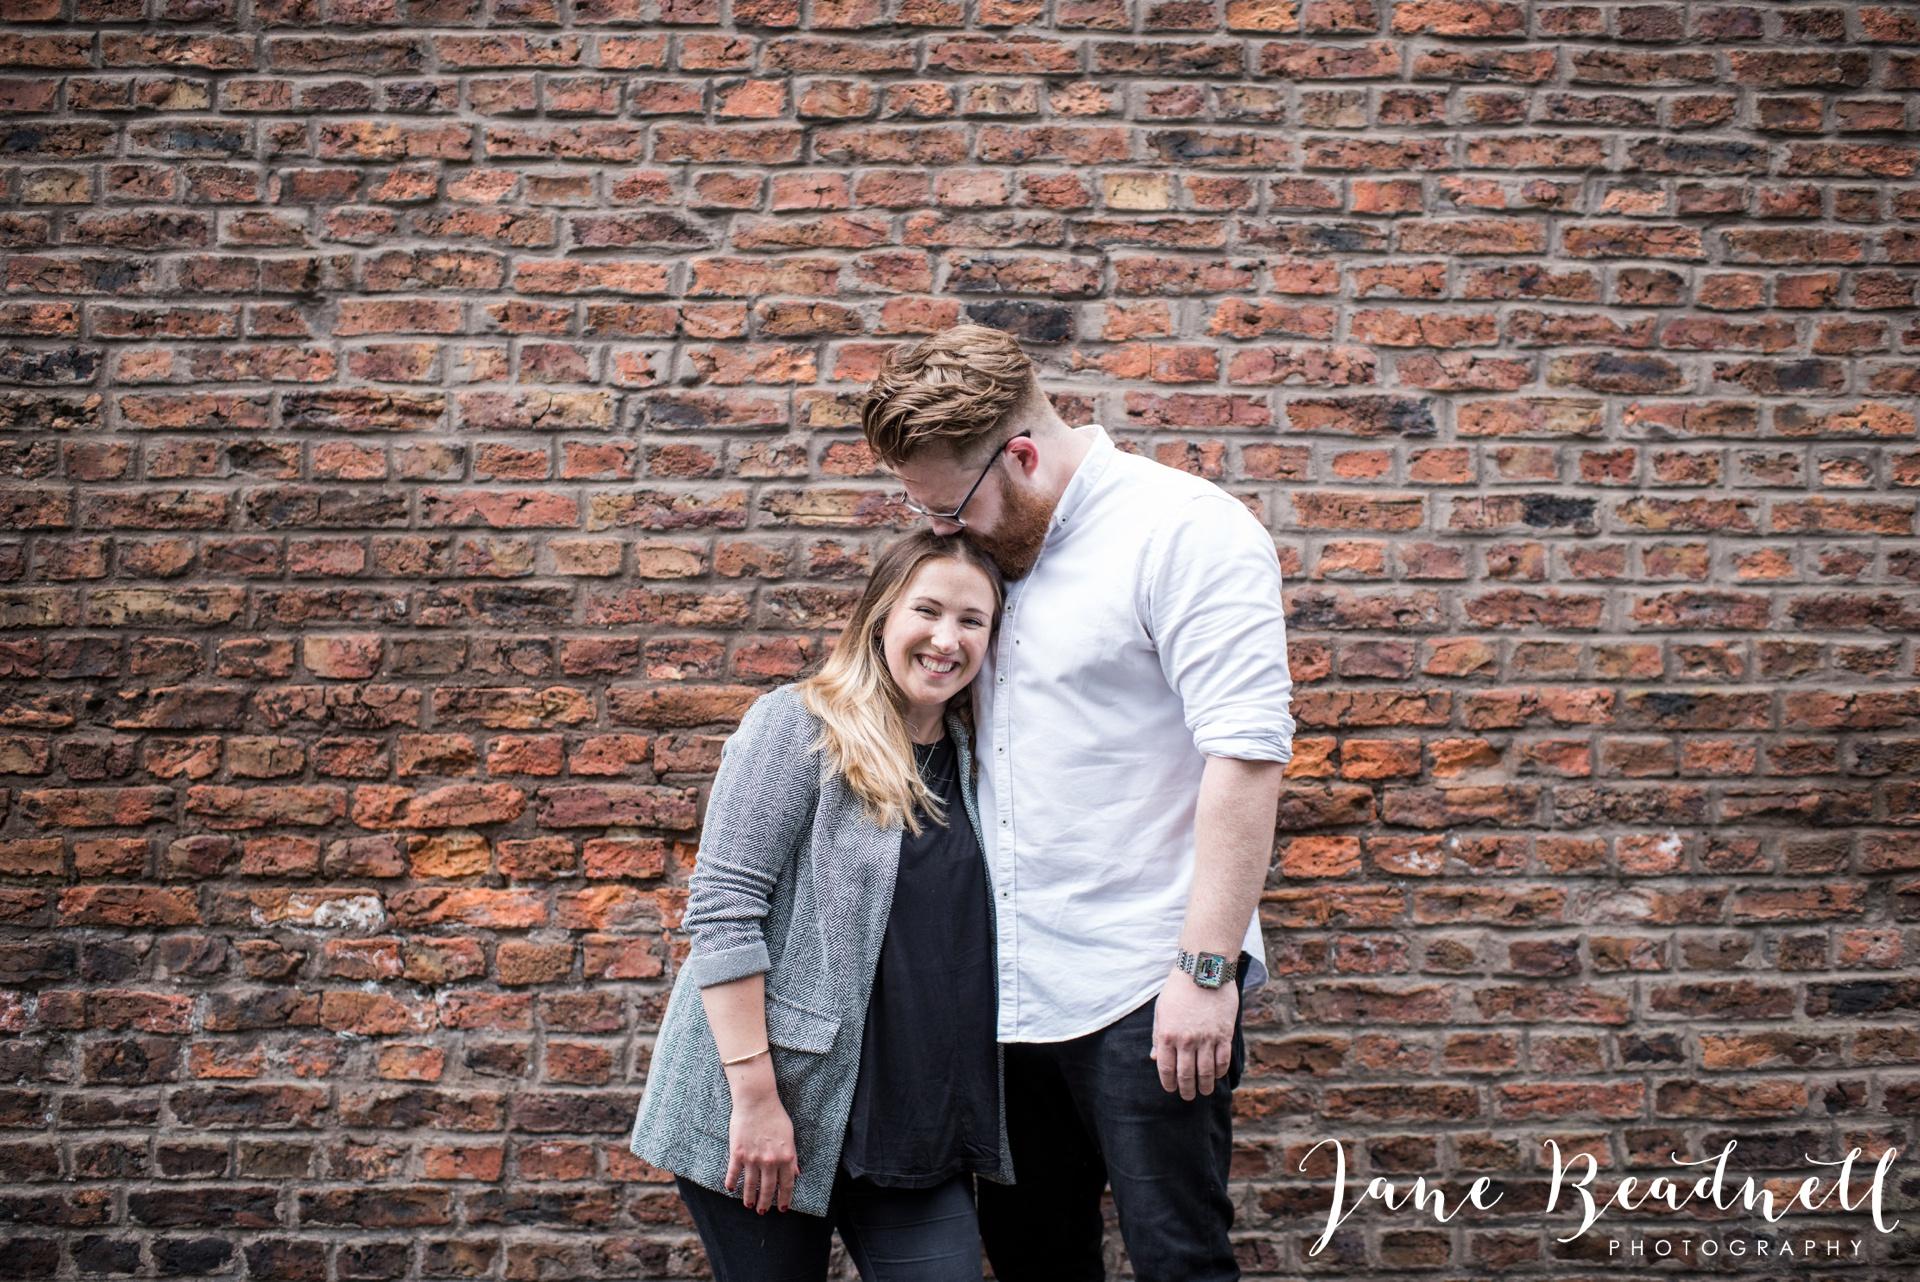 fine-art-engagement-photography-leeds-jane-beadnell-photography_0003